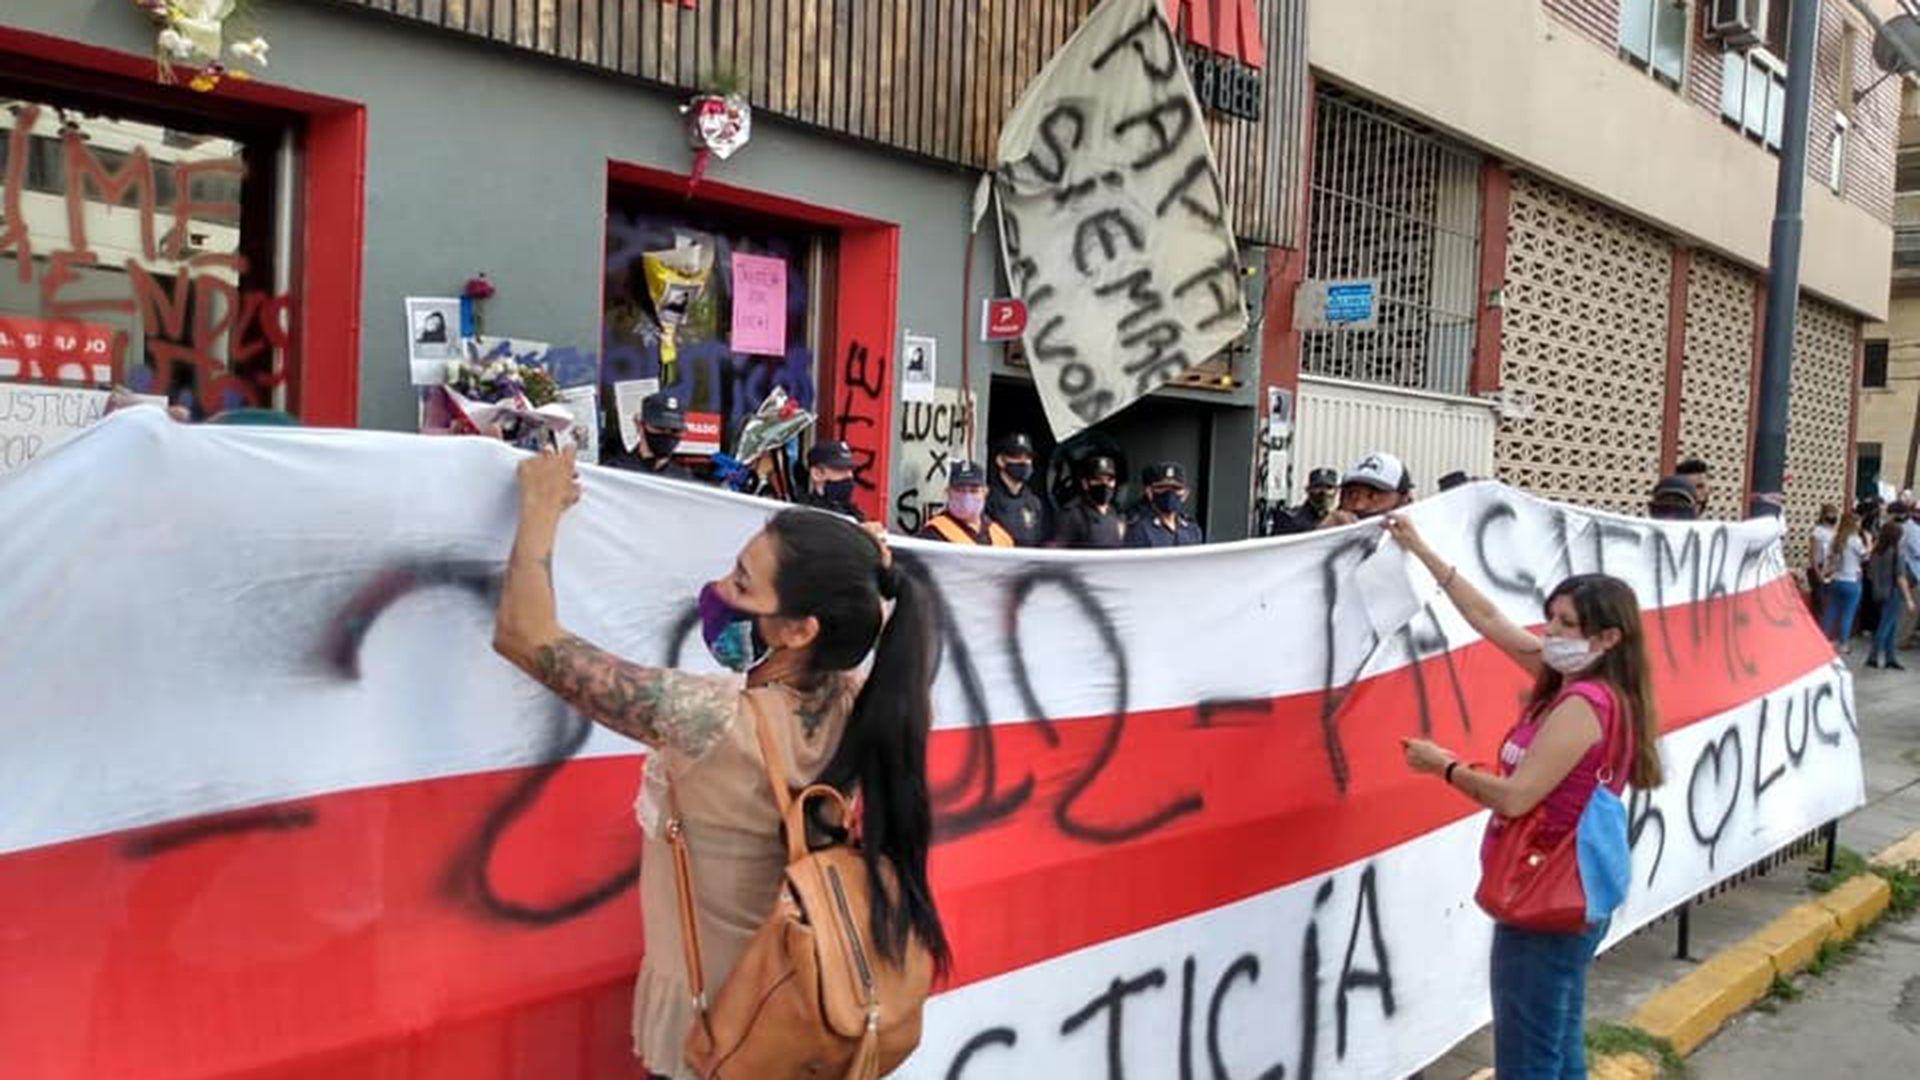 Marcha Lucía Costa